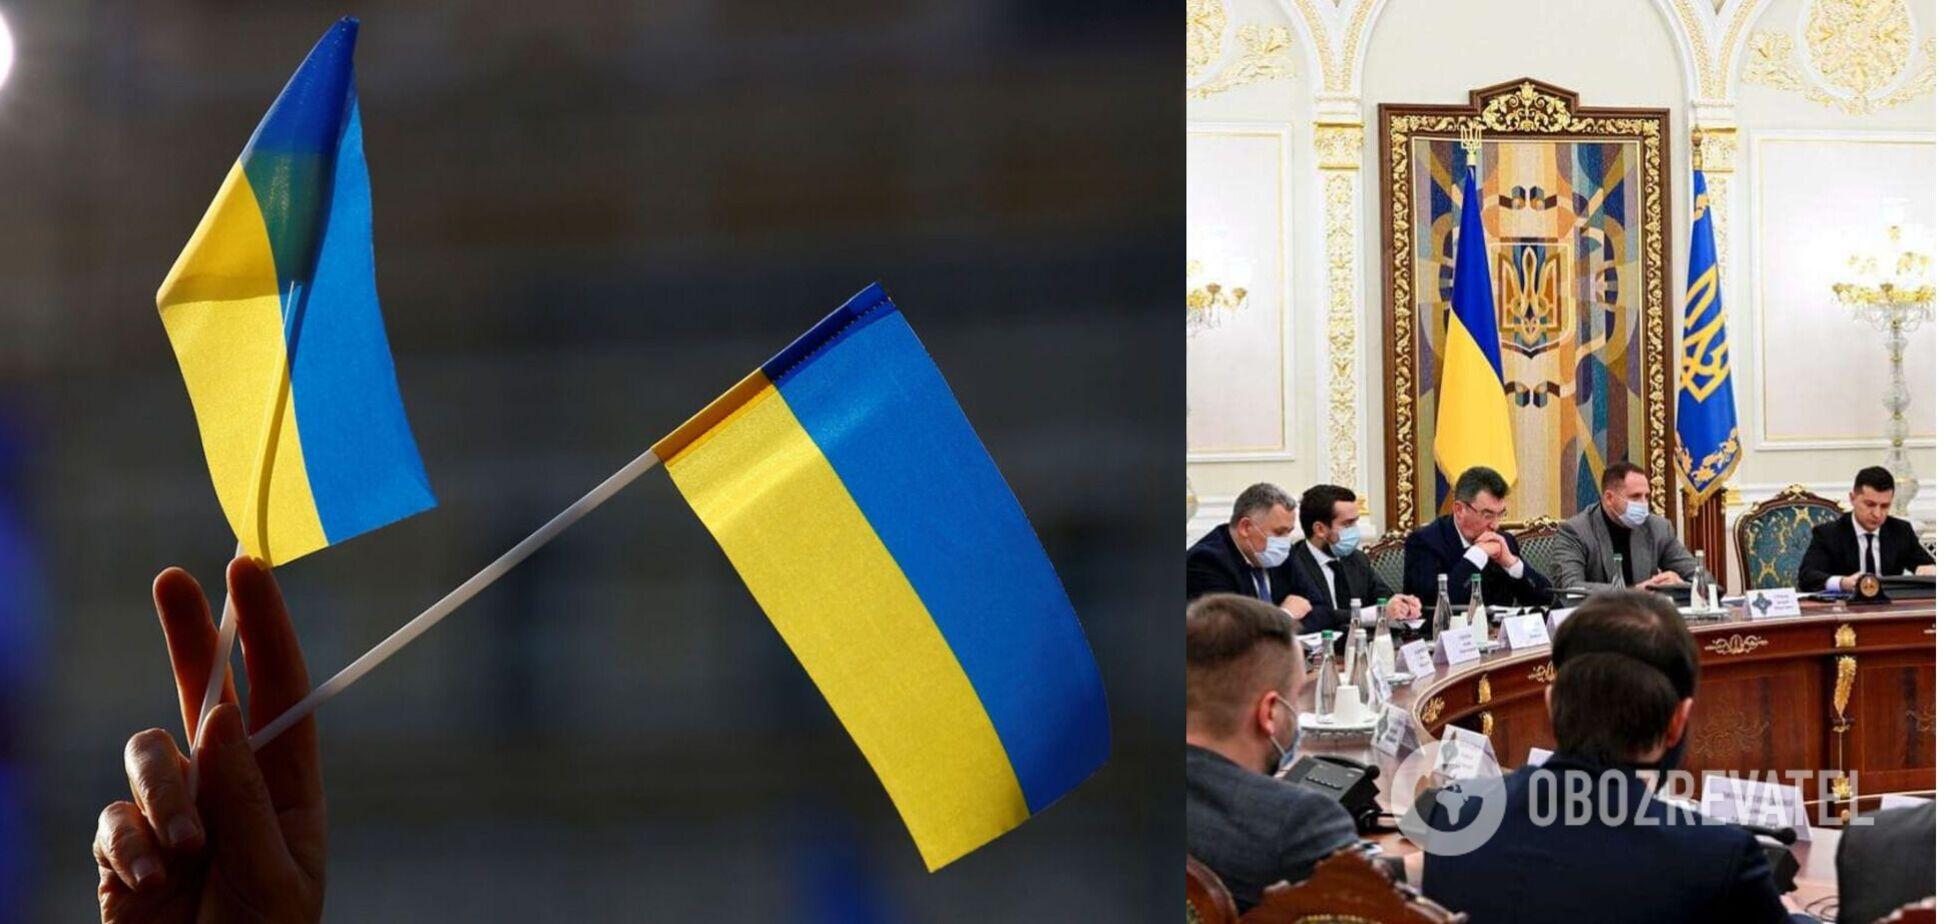 РНБО нарахувала 13 олігархів: українці назвали їхні імена